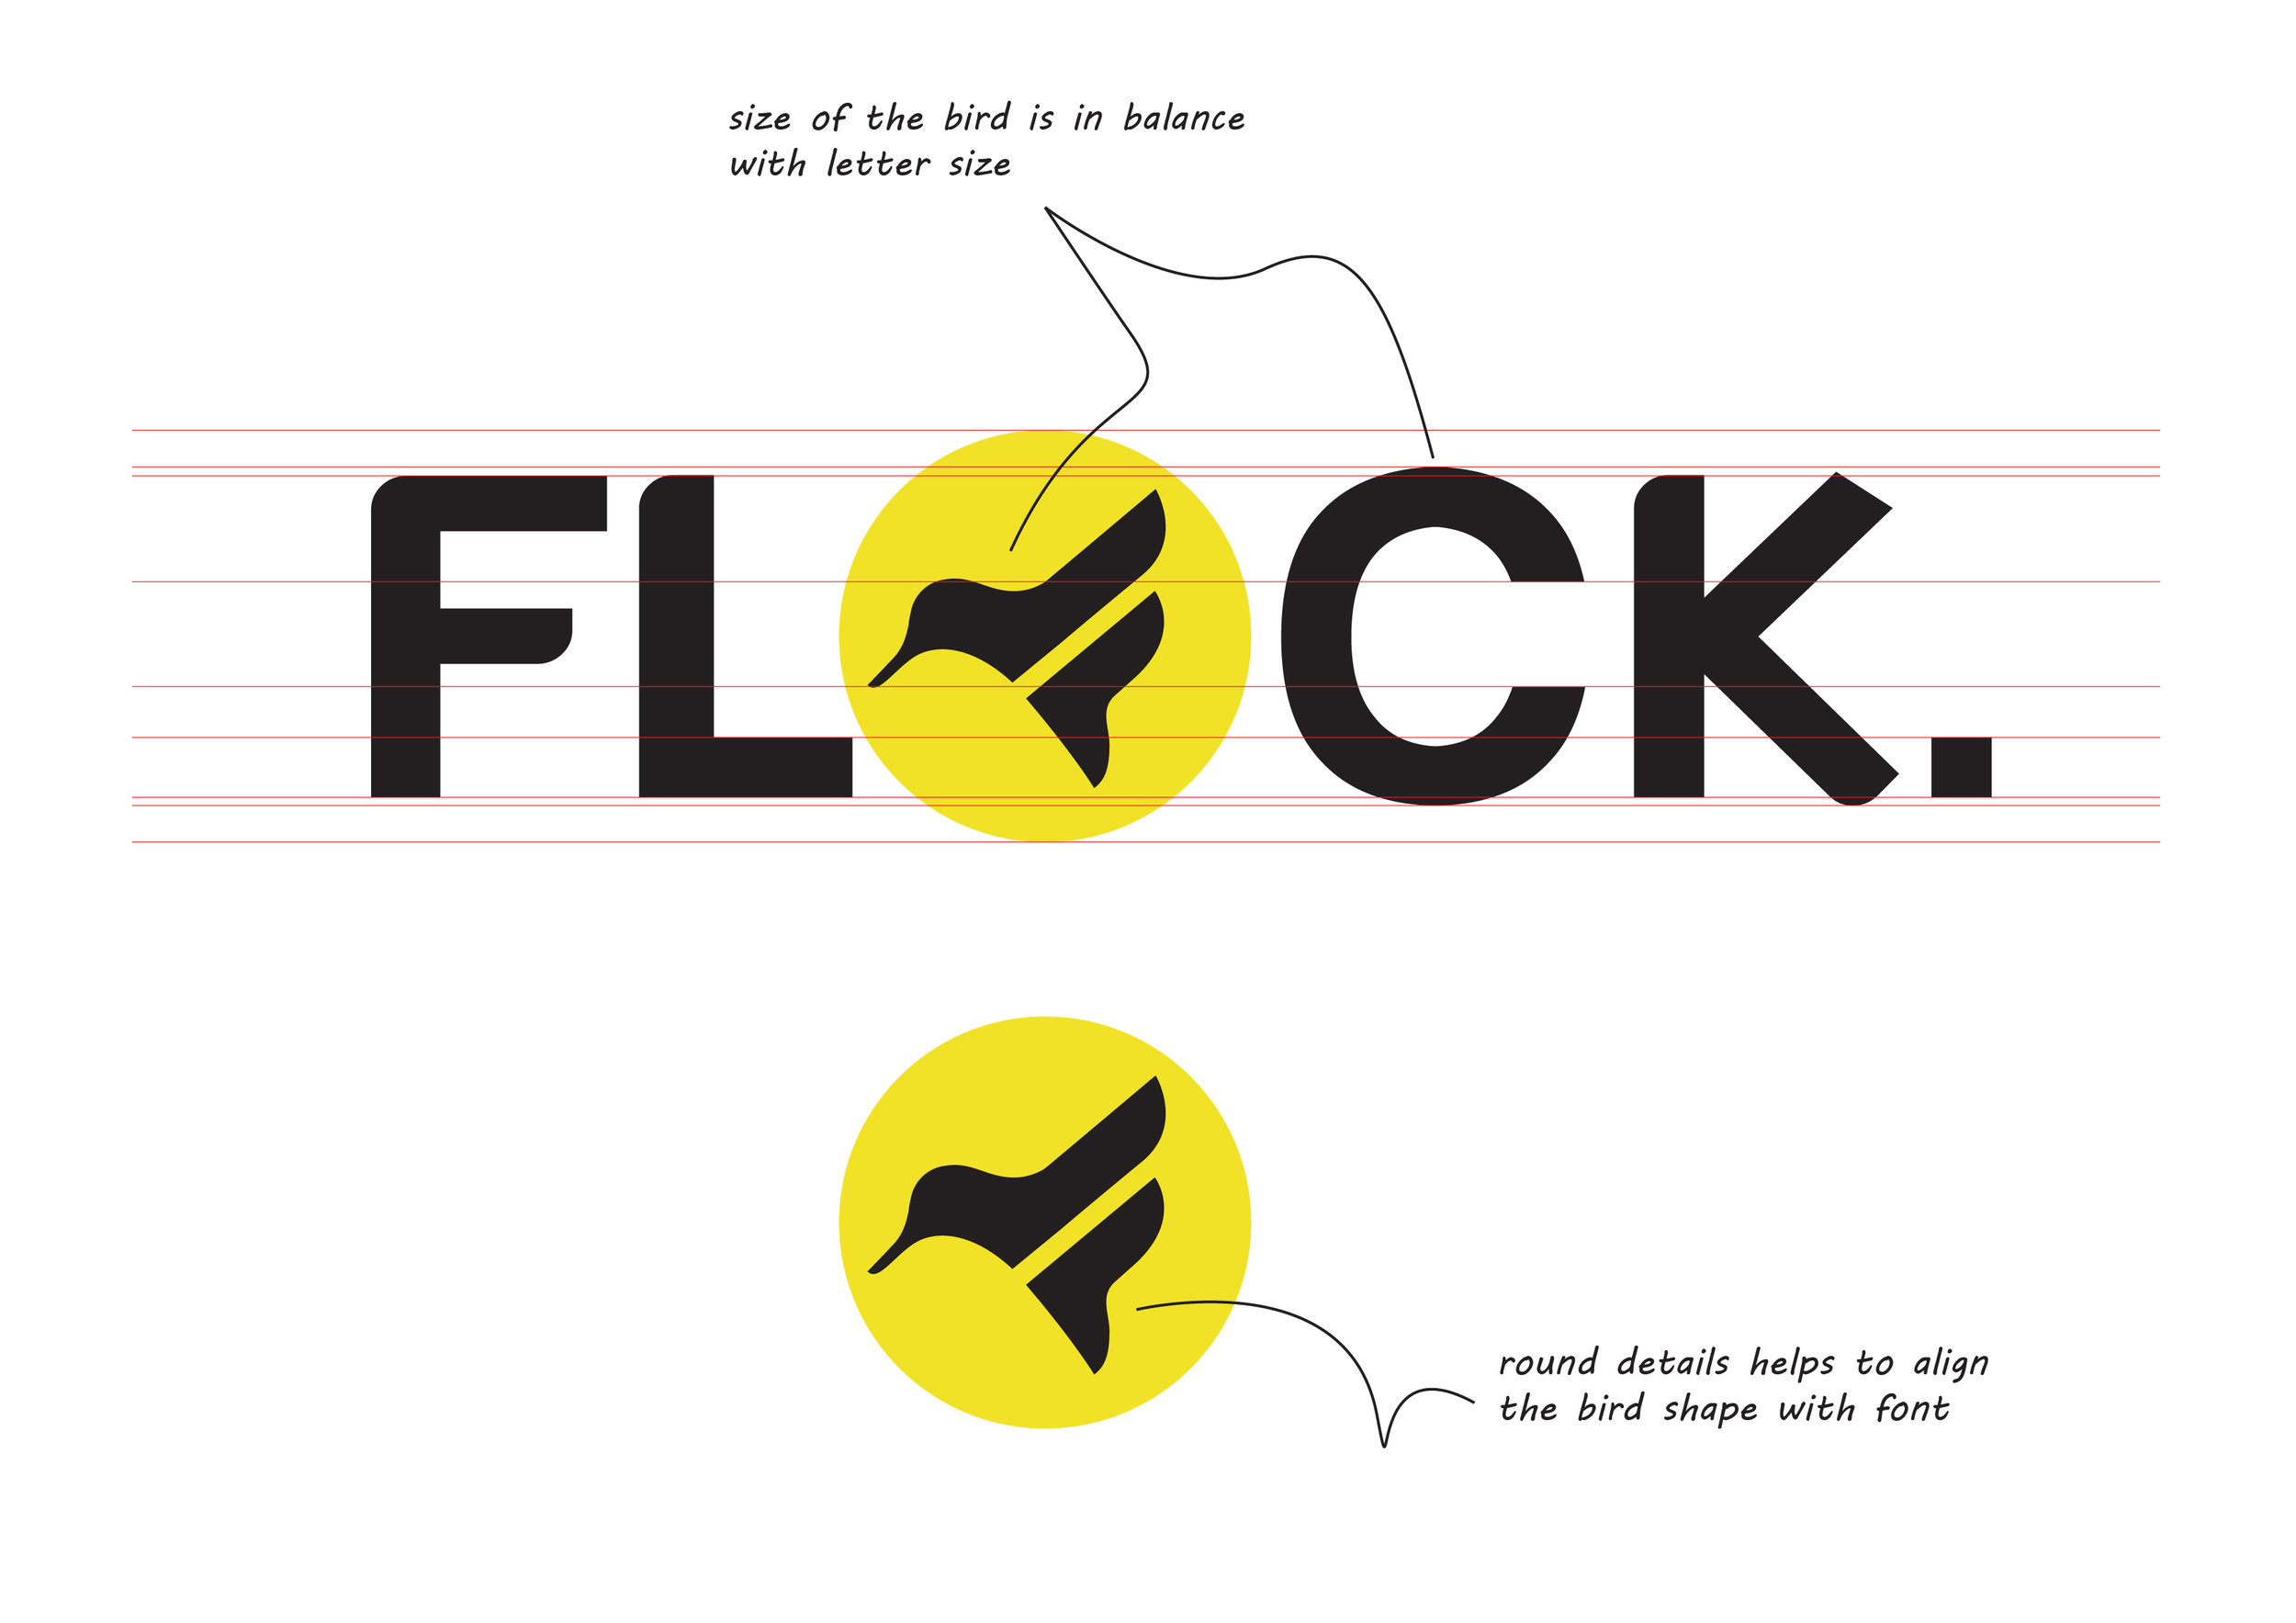 Flock_logo_final-07.jpg